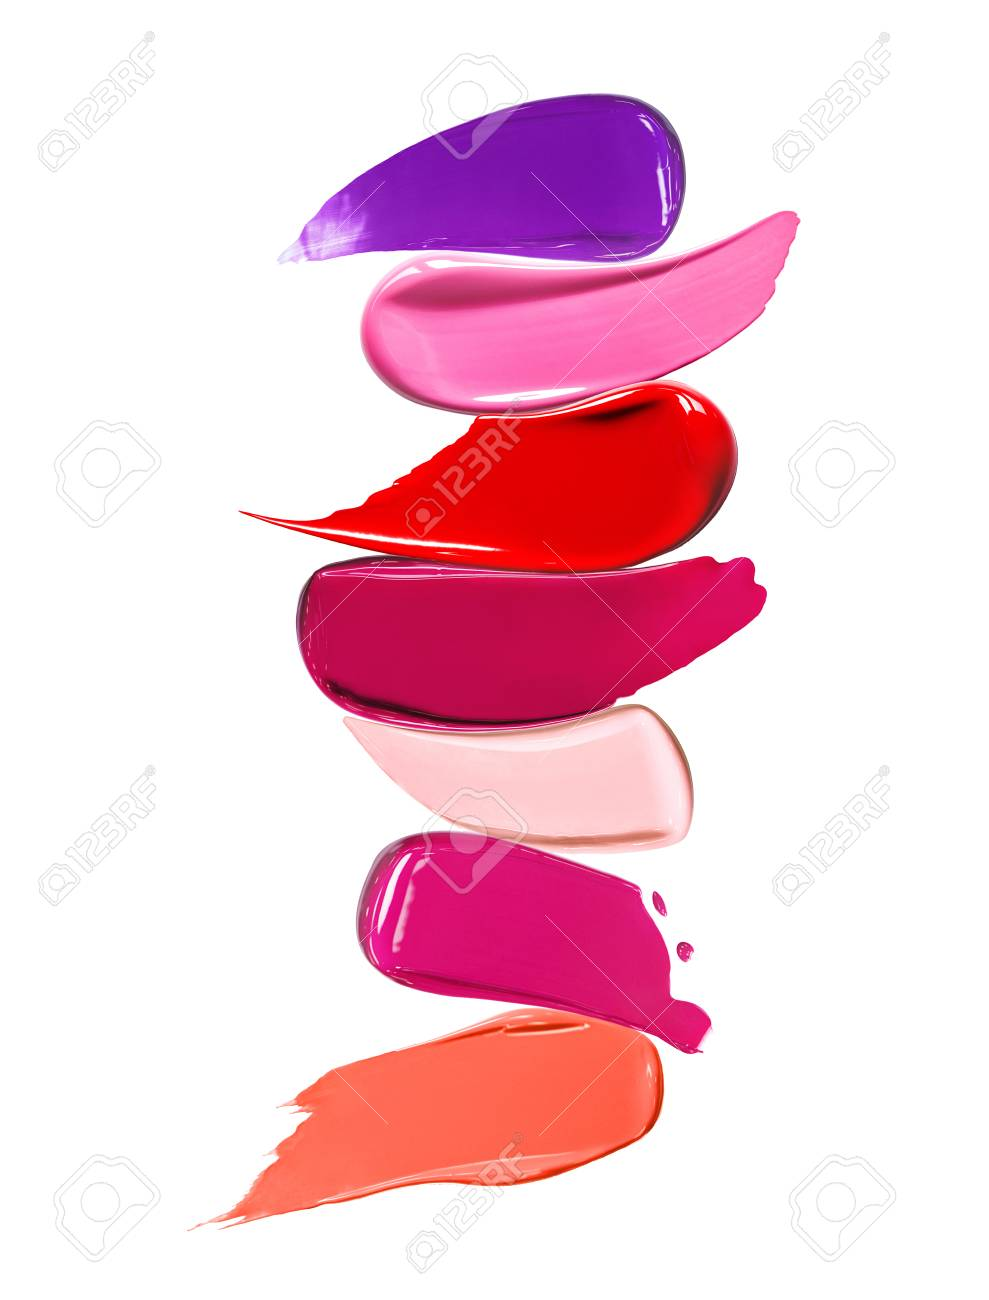 liquid lipstick shades on